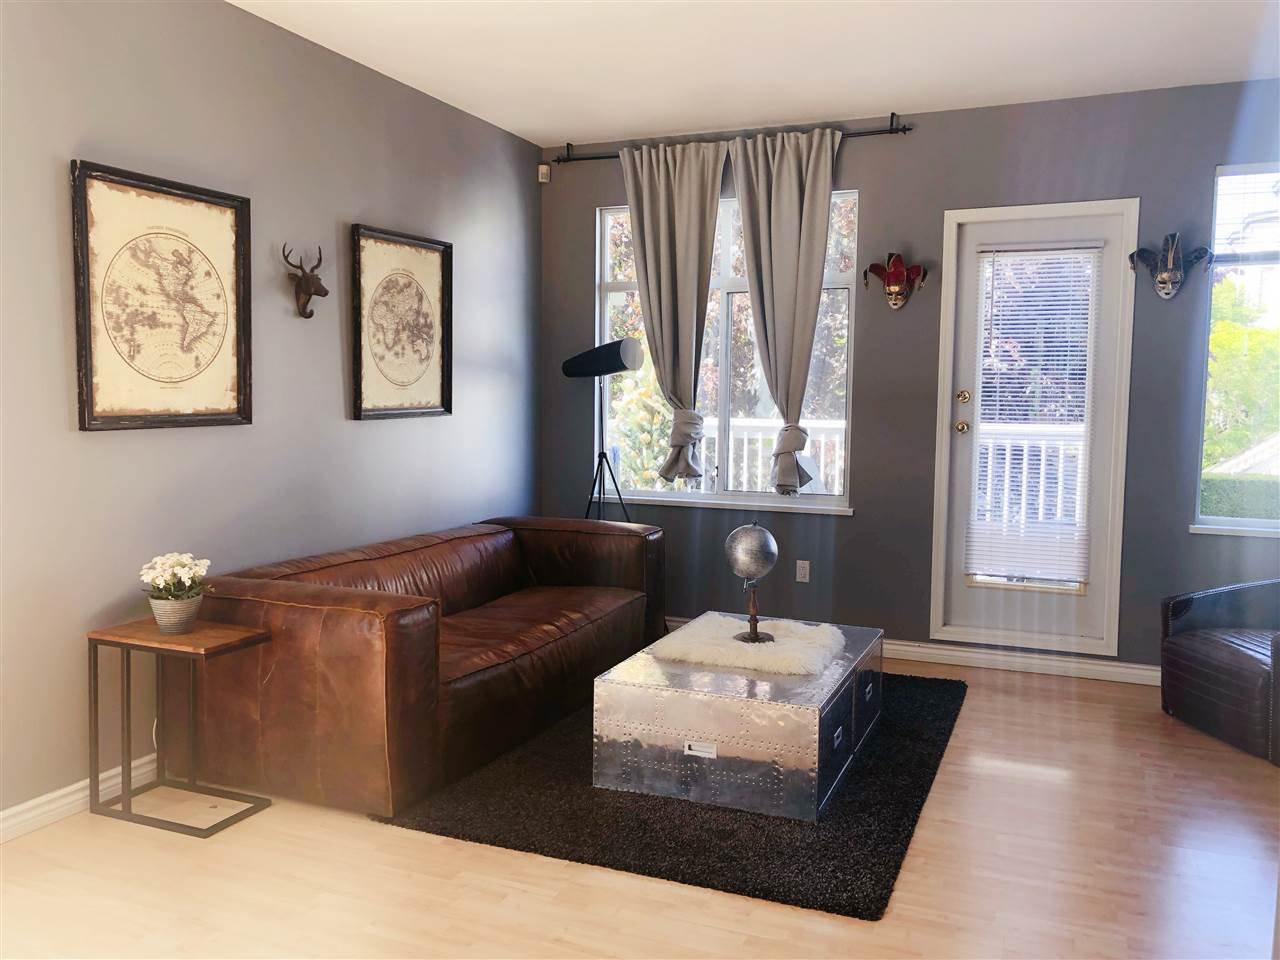 Main Photo: 17 6331 NO. 1 Road in Richmond: Terra Nova Townhouse for sale : MLS®# R2380939